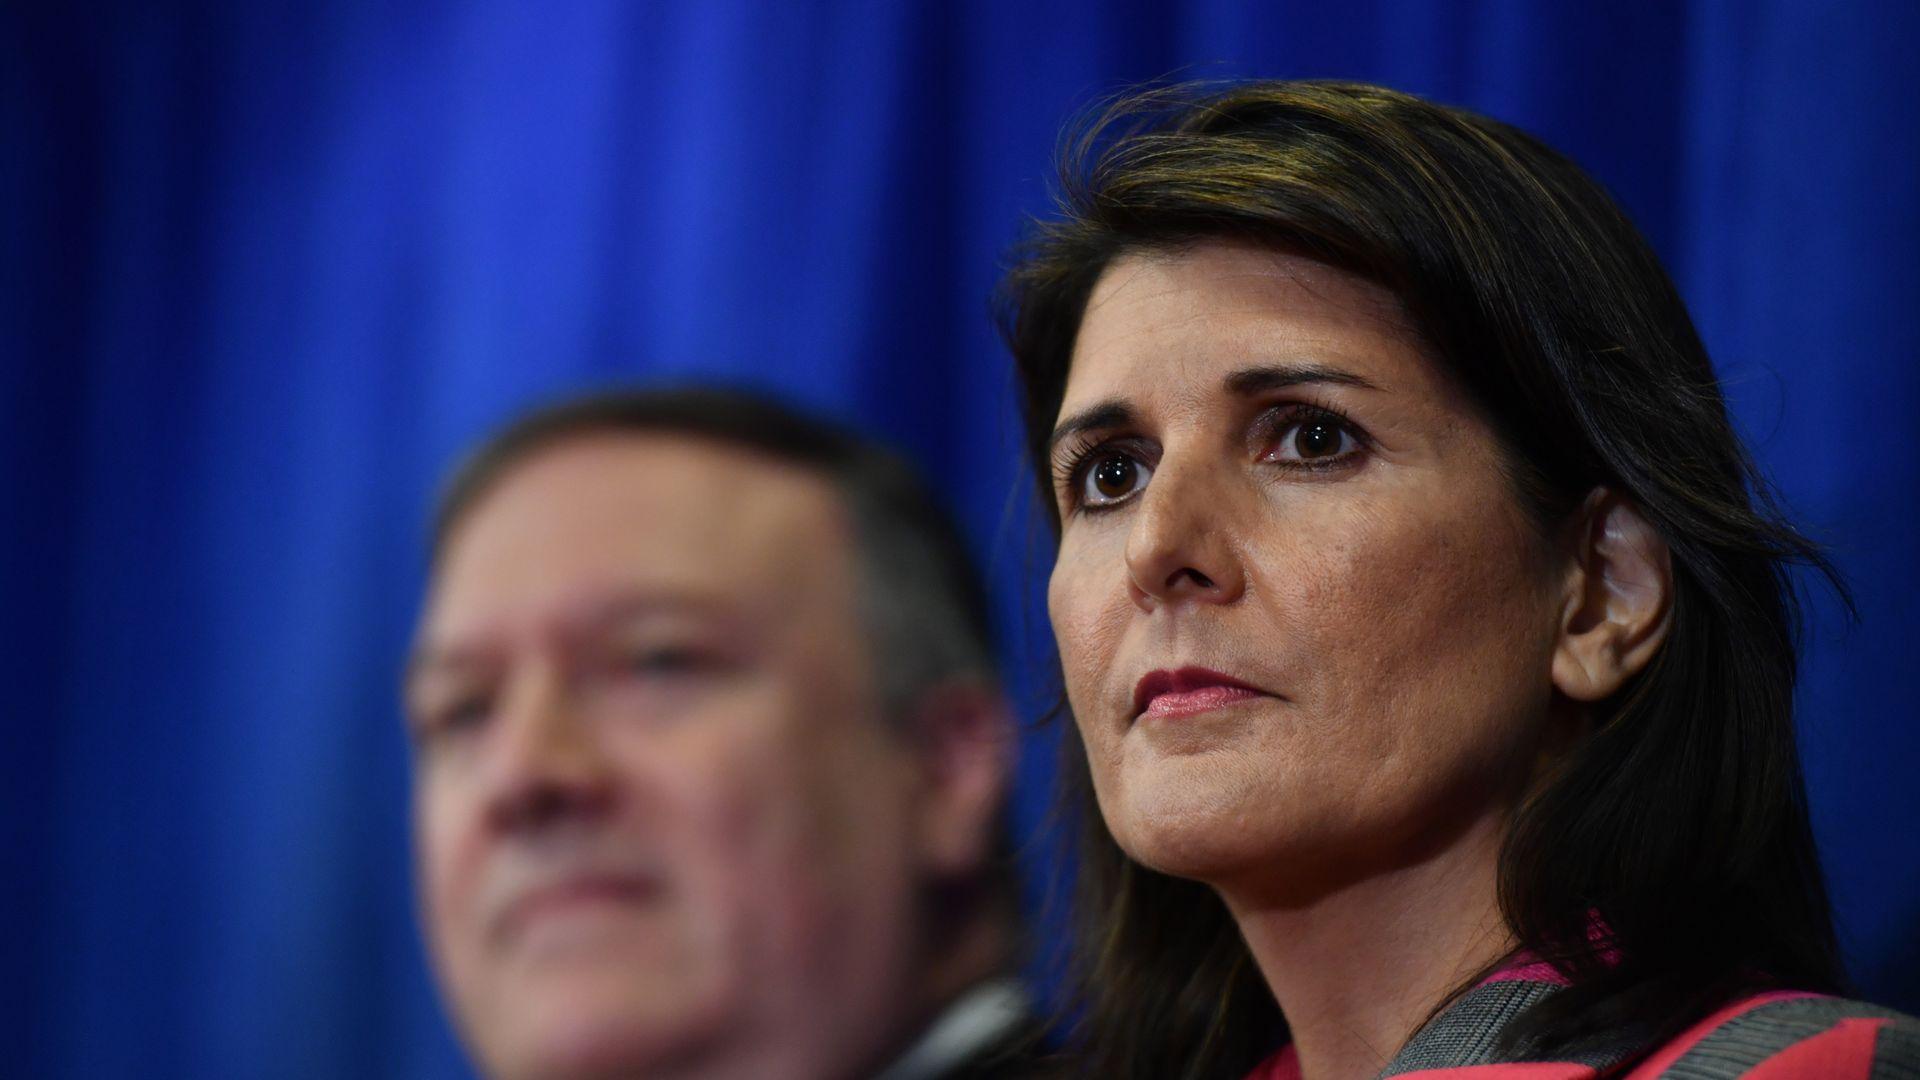 Scoop: Trump has accepted Nikki Haley's resignation